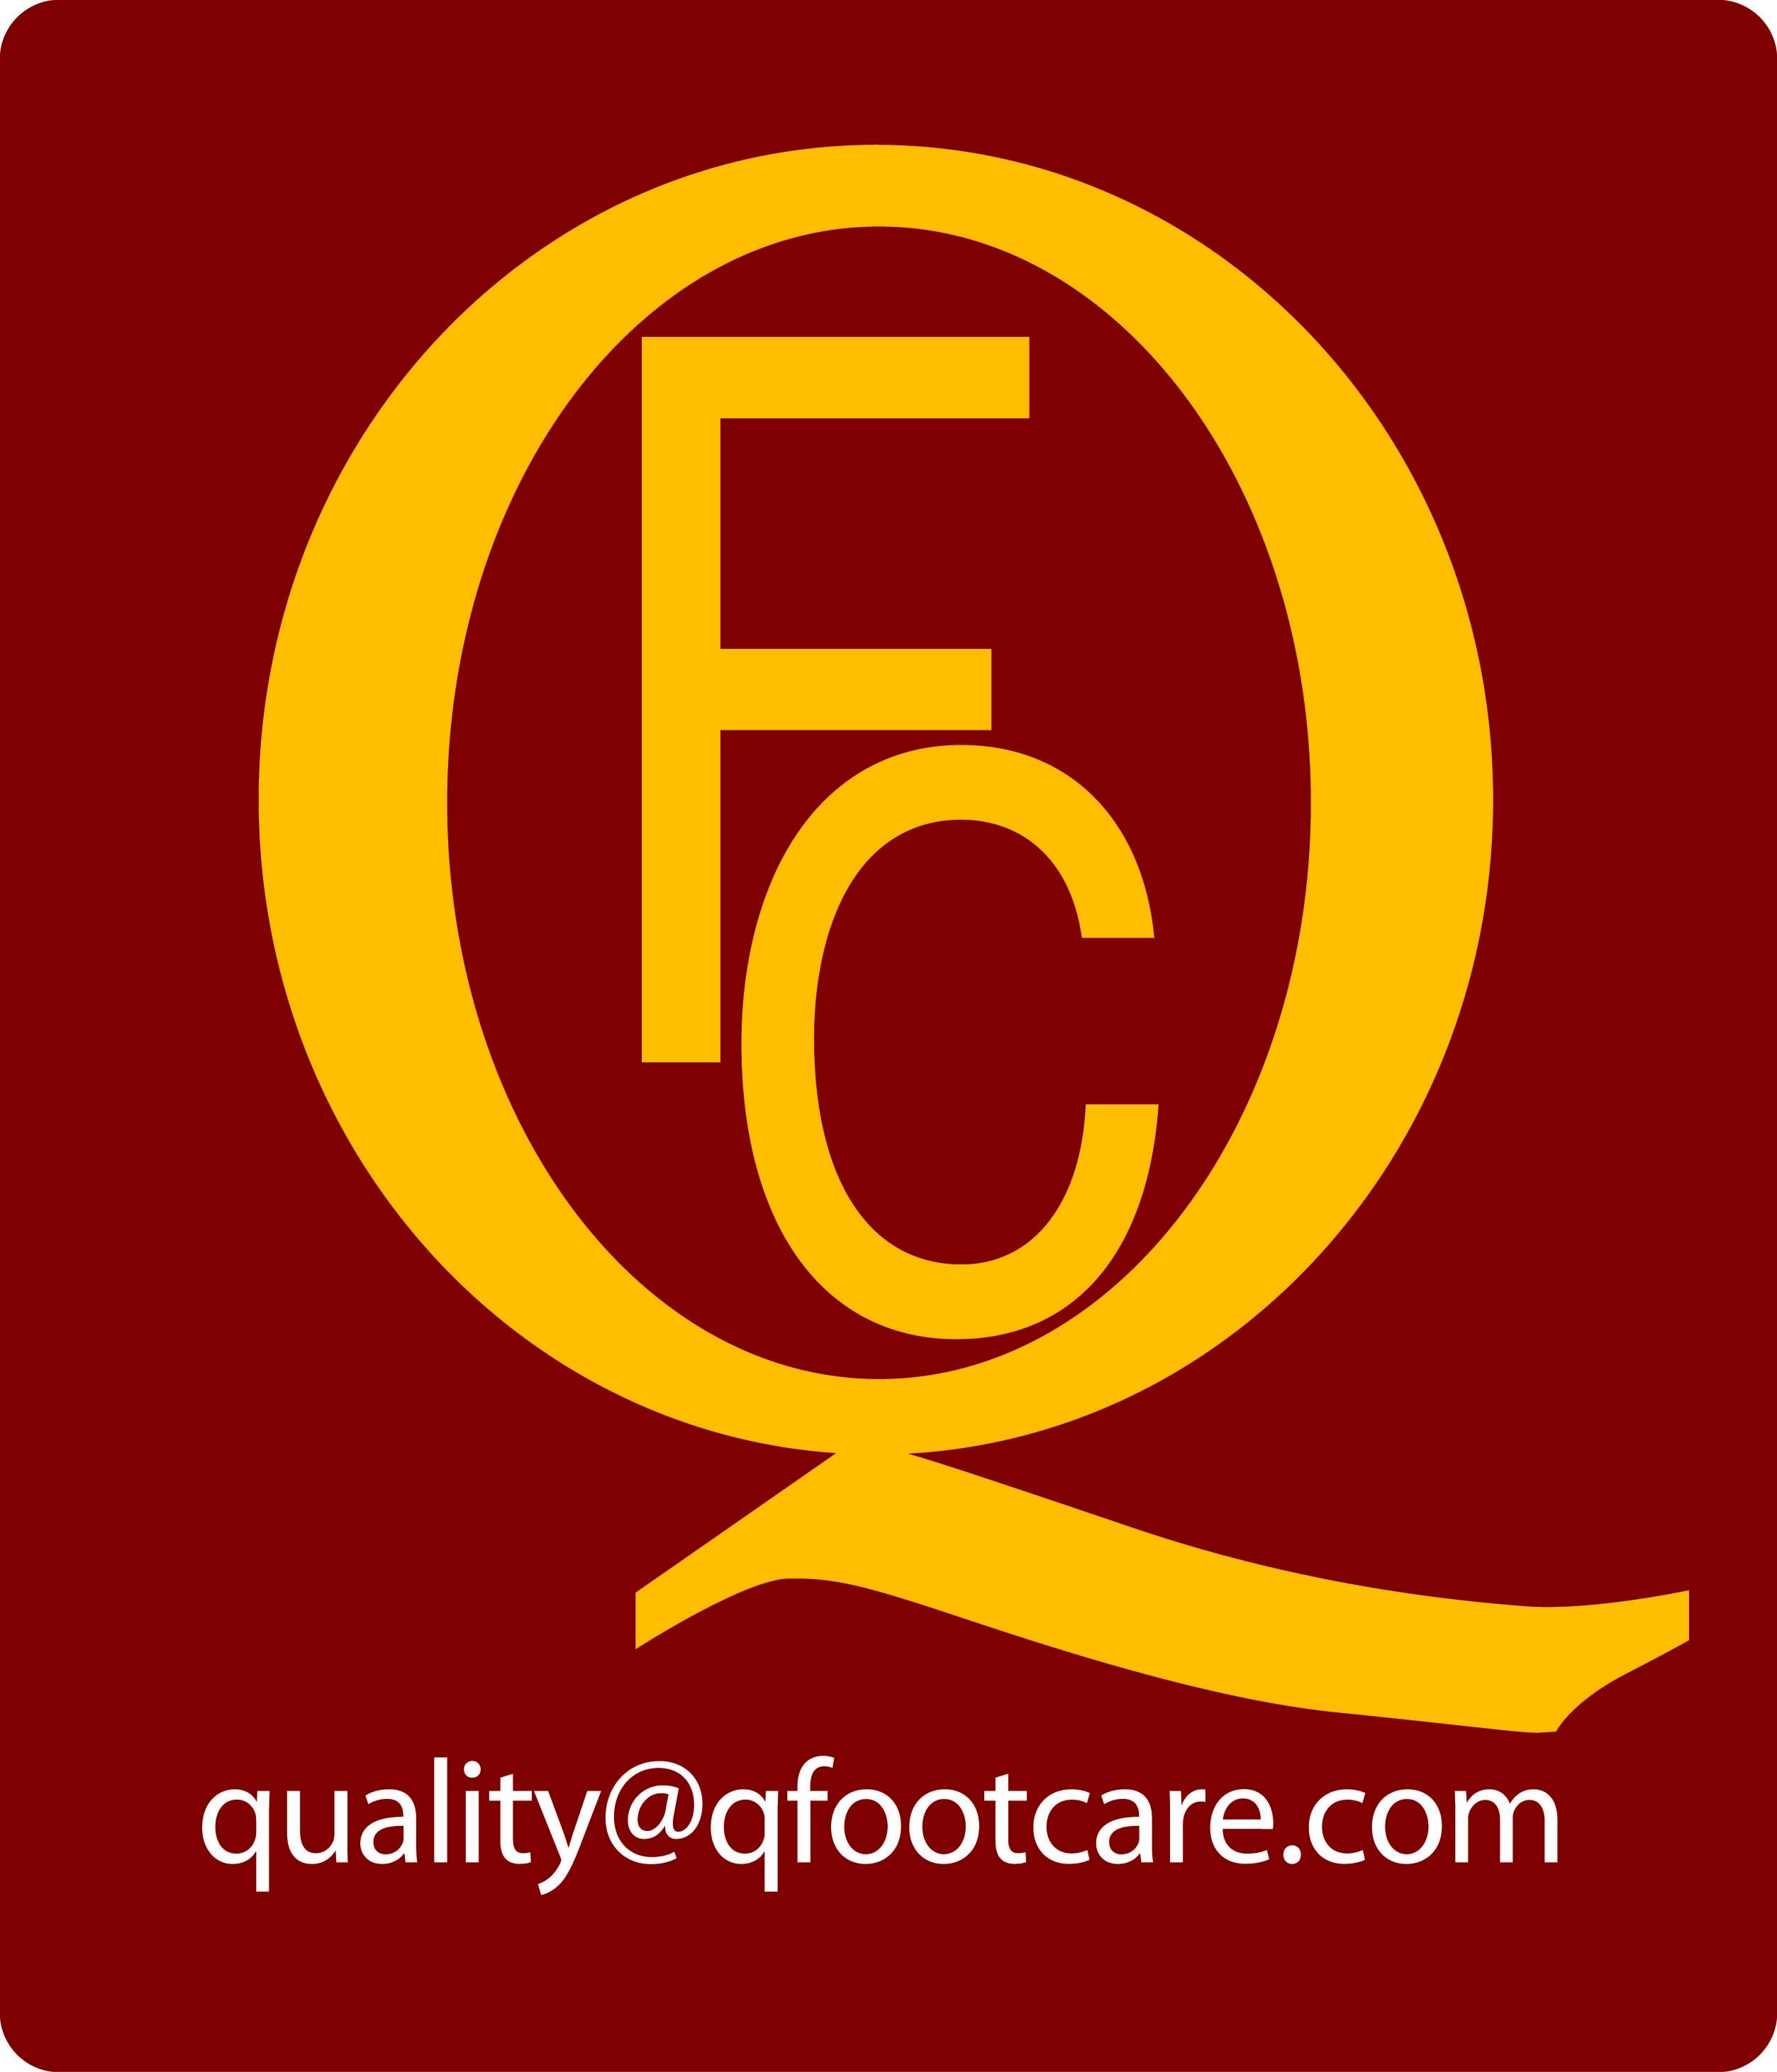 QFClogo (new)